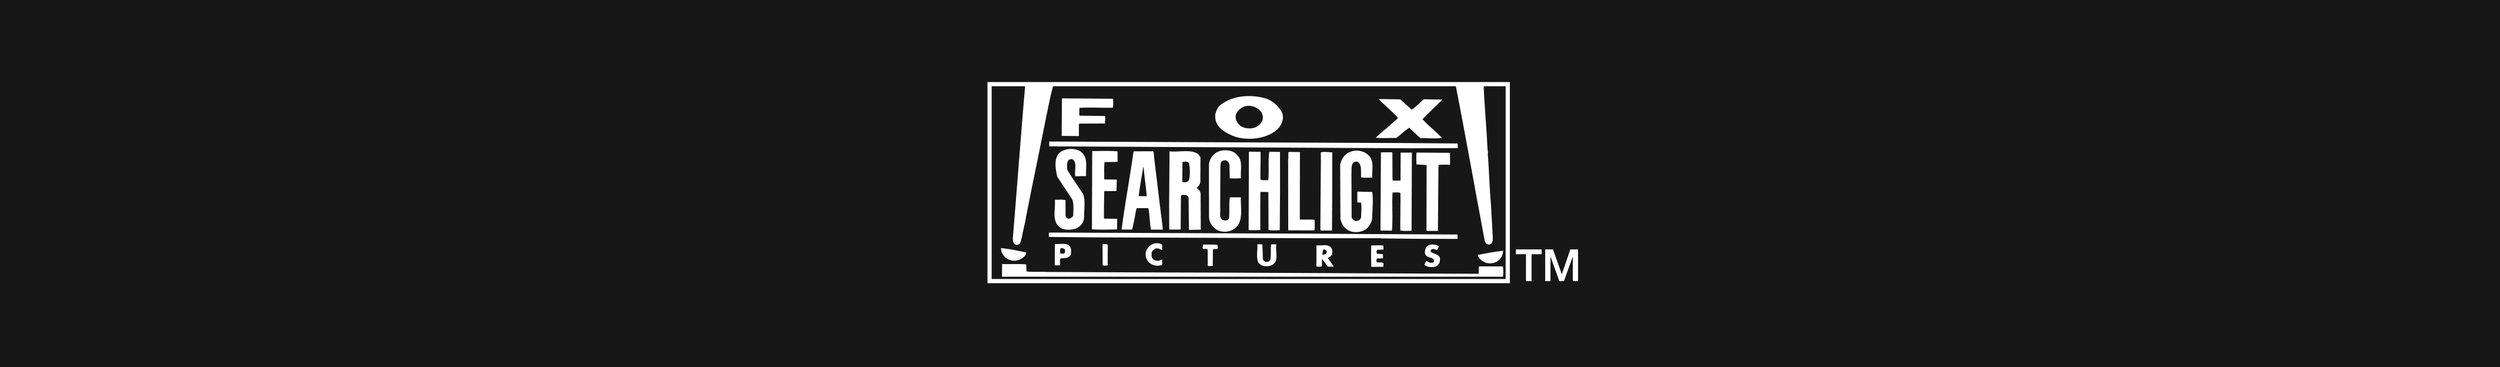 IntWebsite_Clients_White_FoxSearchlight_02.jpg